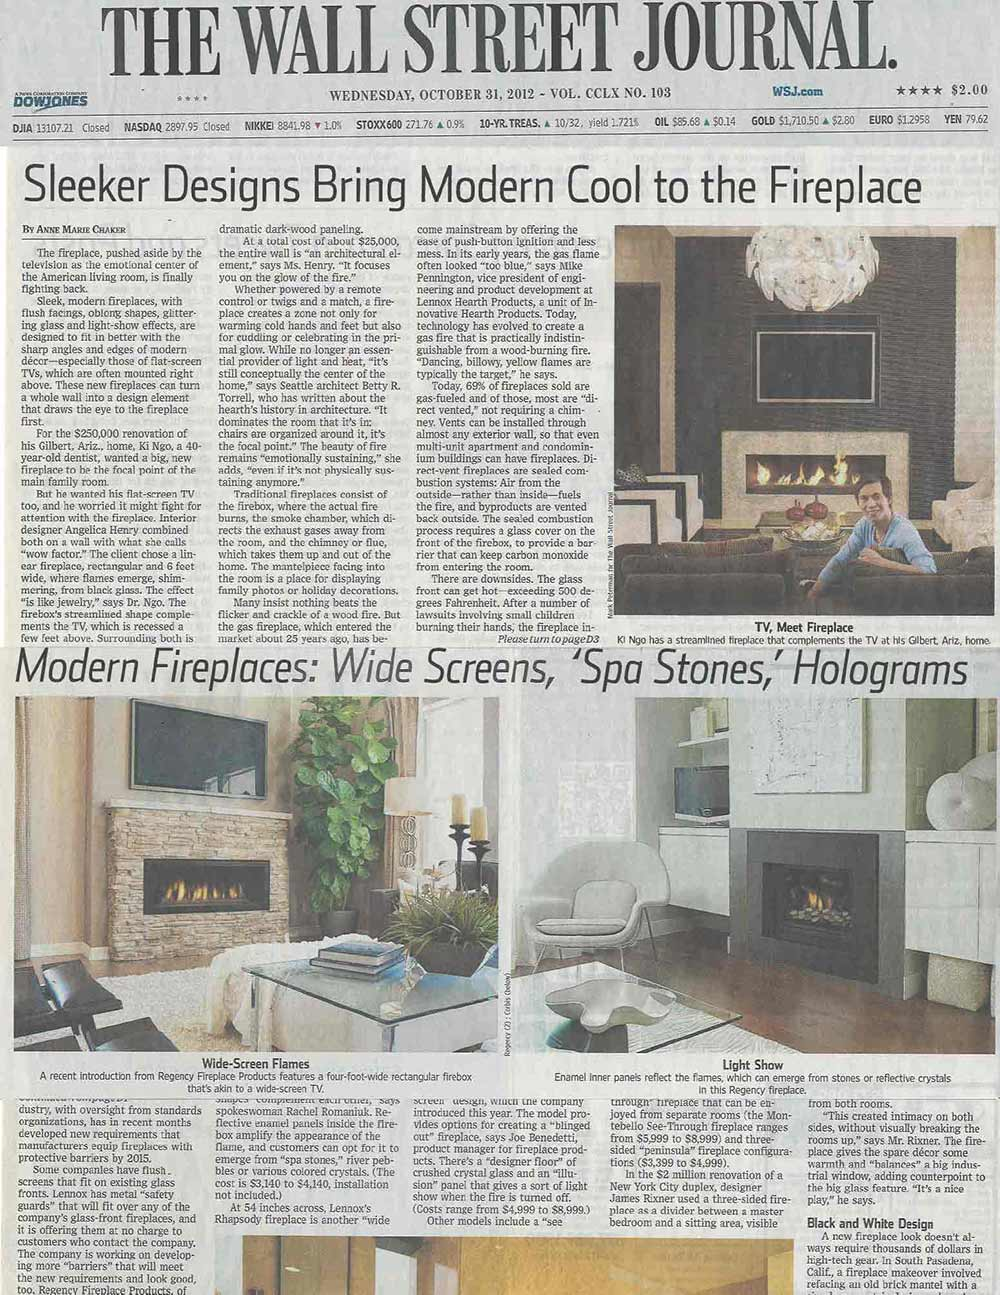 Best Interior Design Company in Scottsdale Arizona Paradise Valley